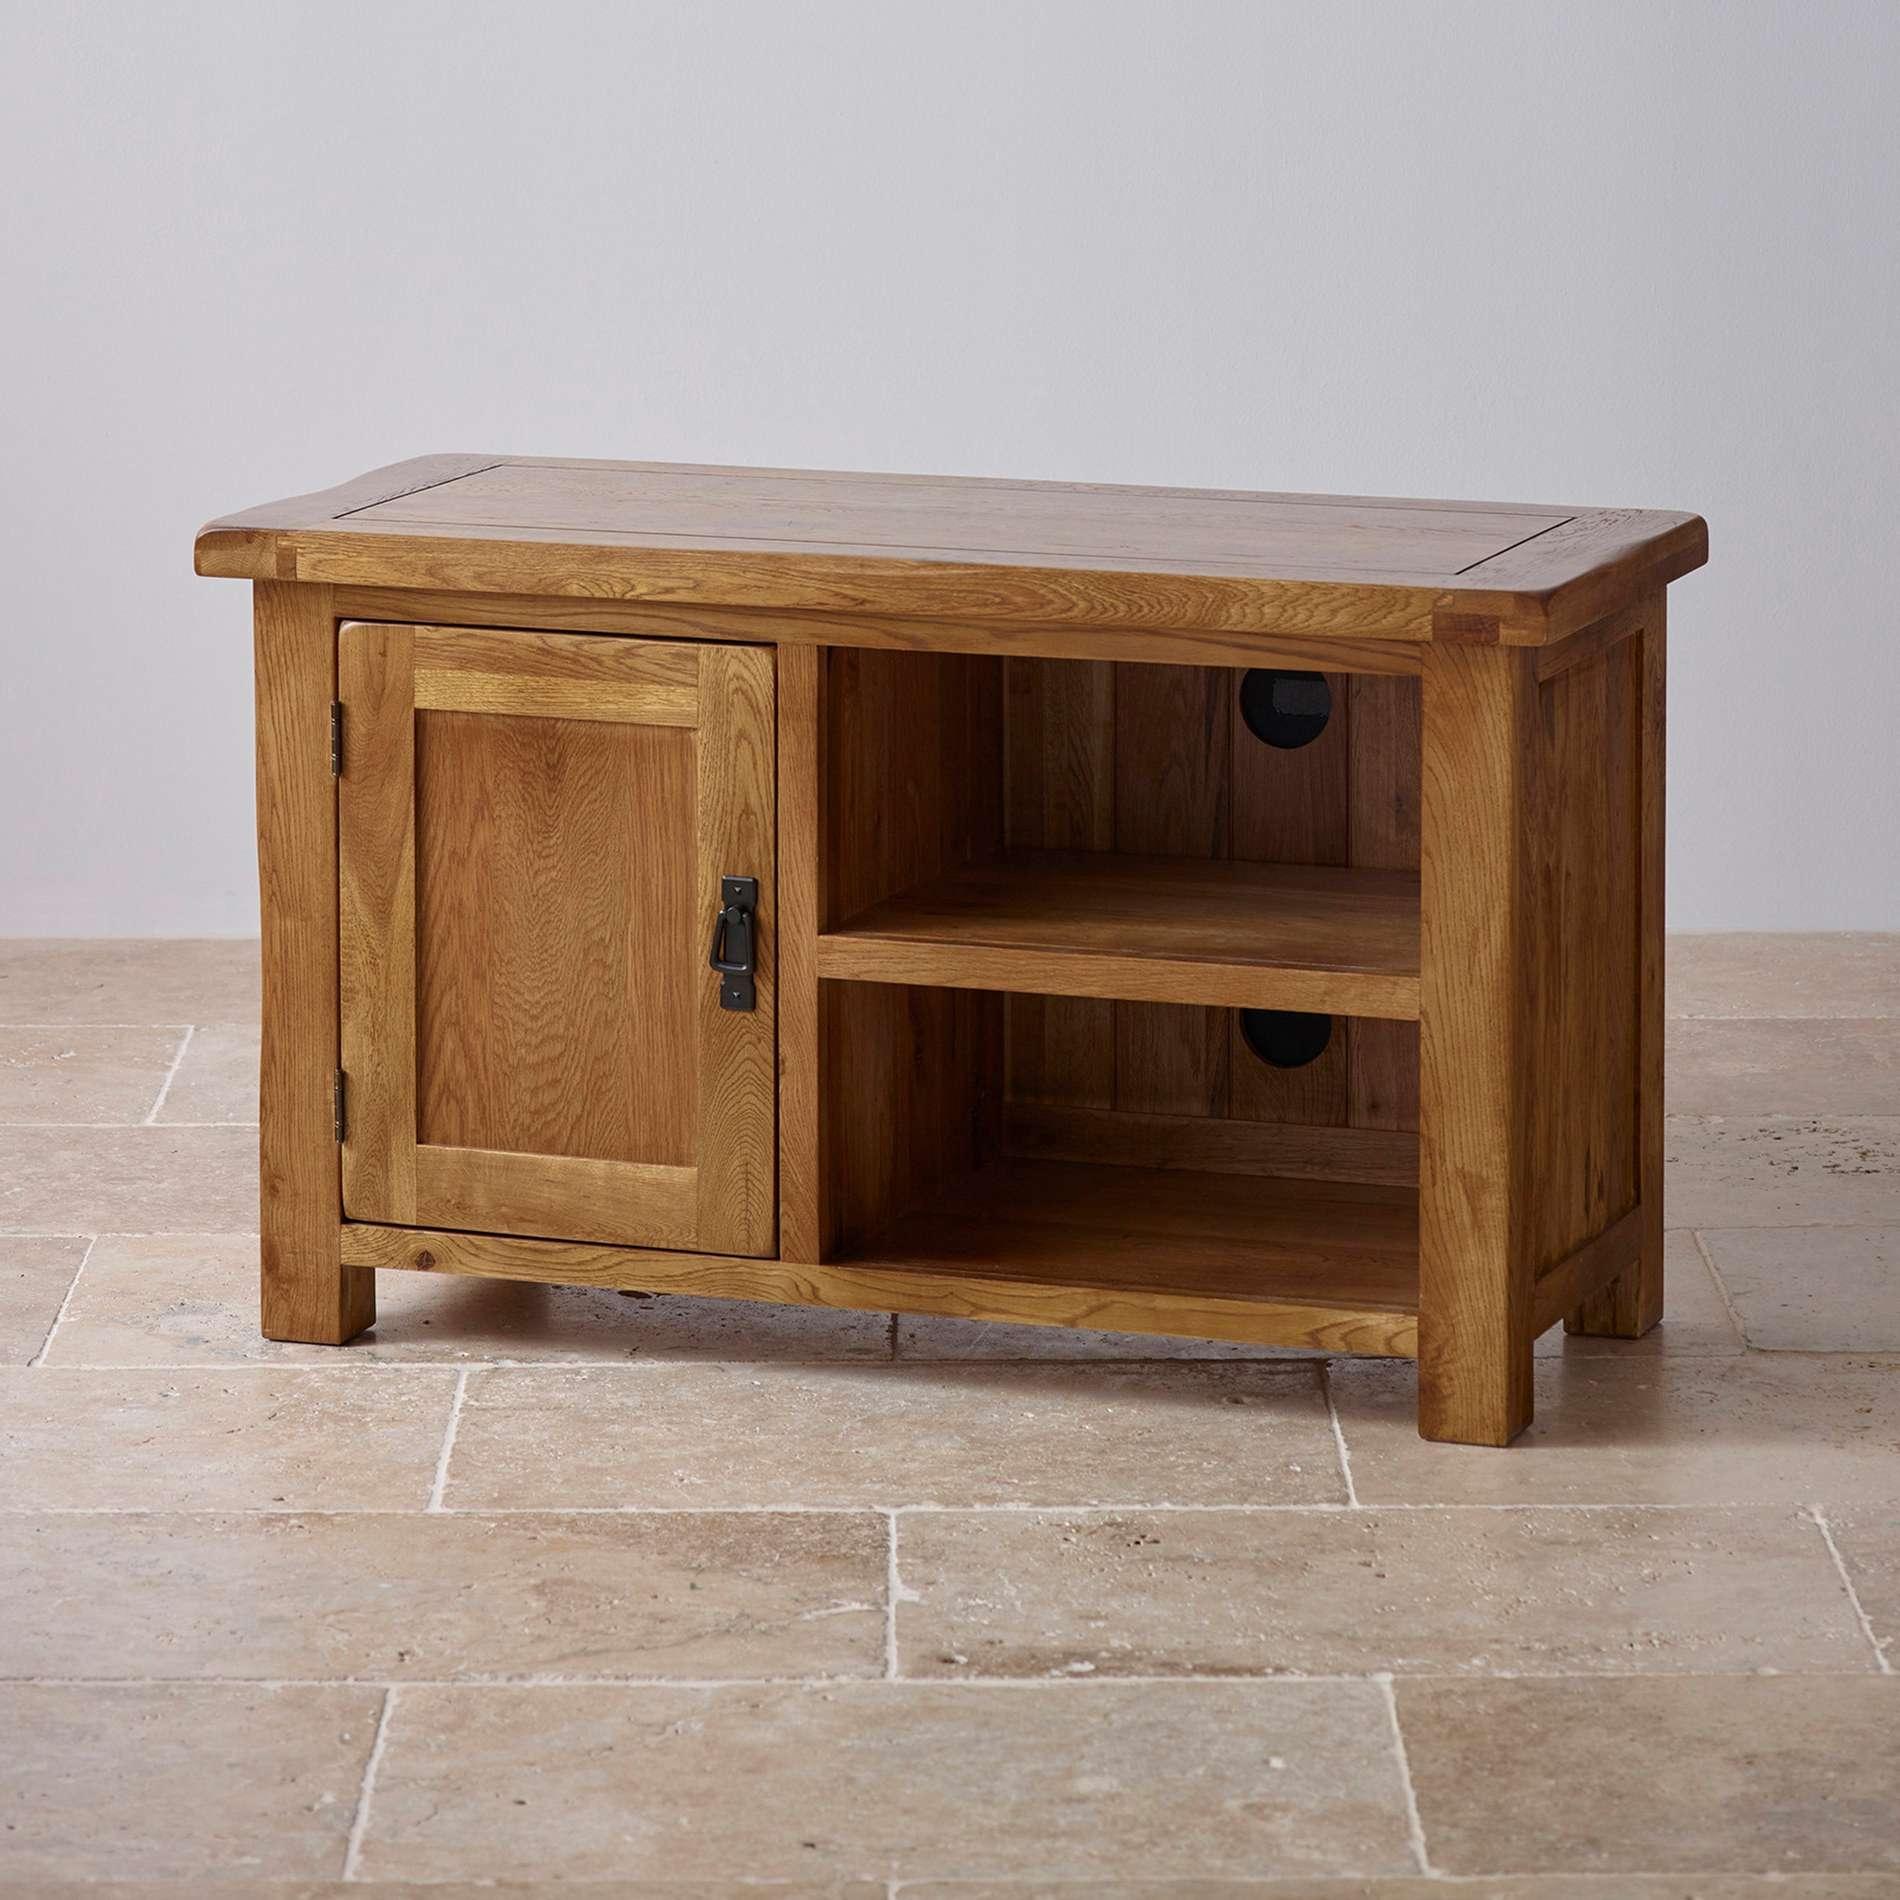 Original Rustic Tv Cabinet In Solid Oak | Oak Furniture Land Intended For Rustic Corner Tv Cabinets (View 5 of 20)